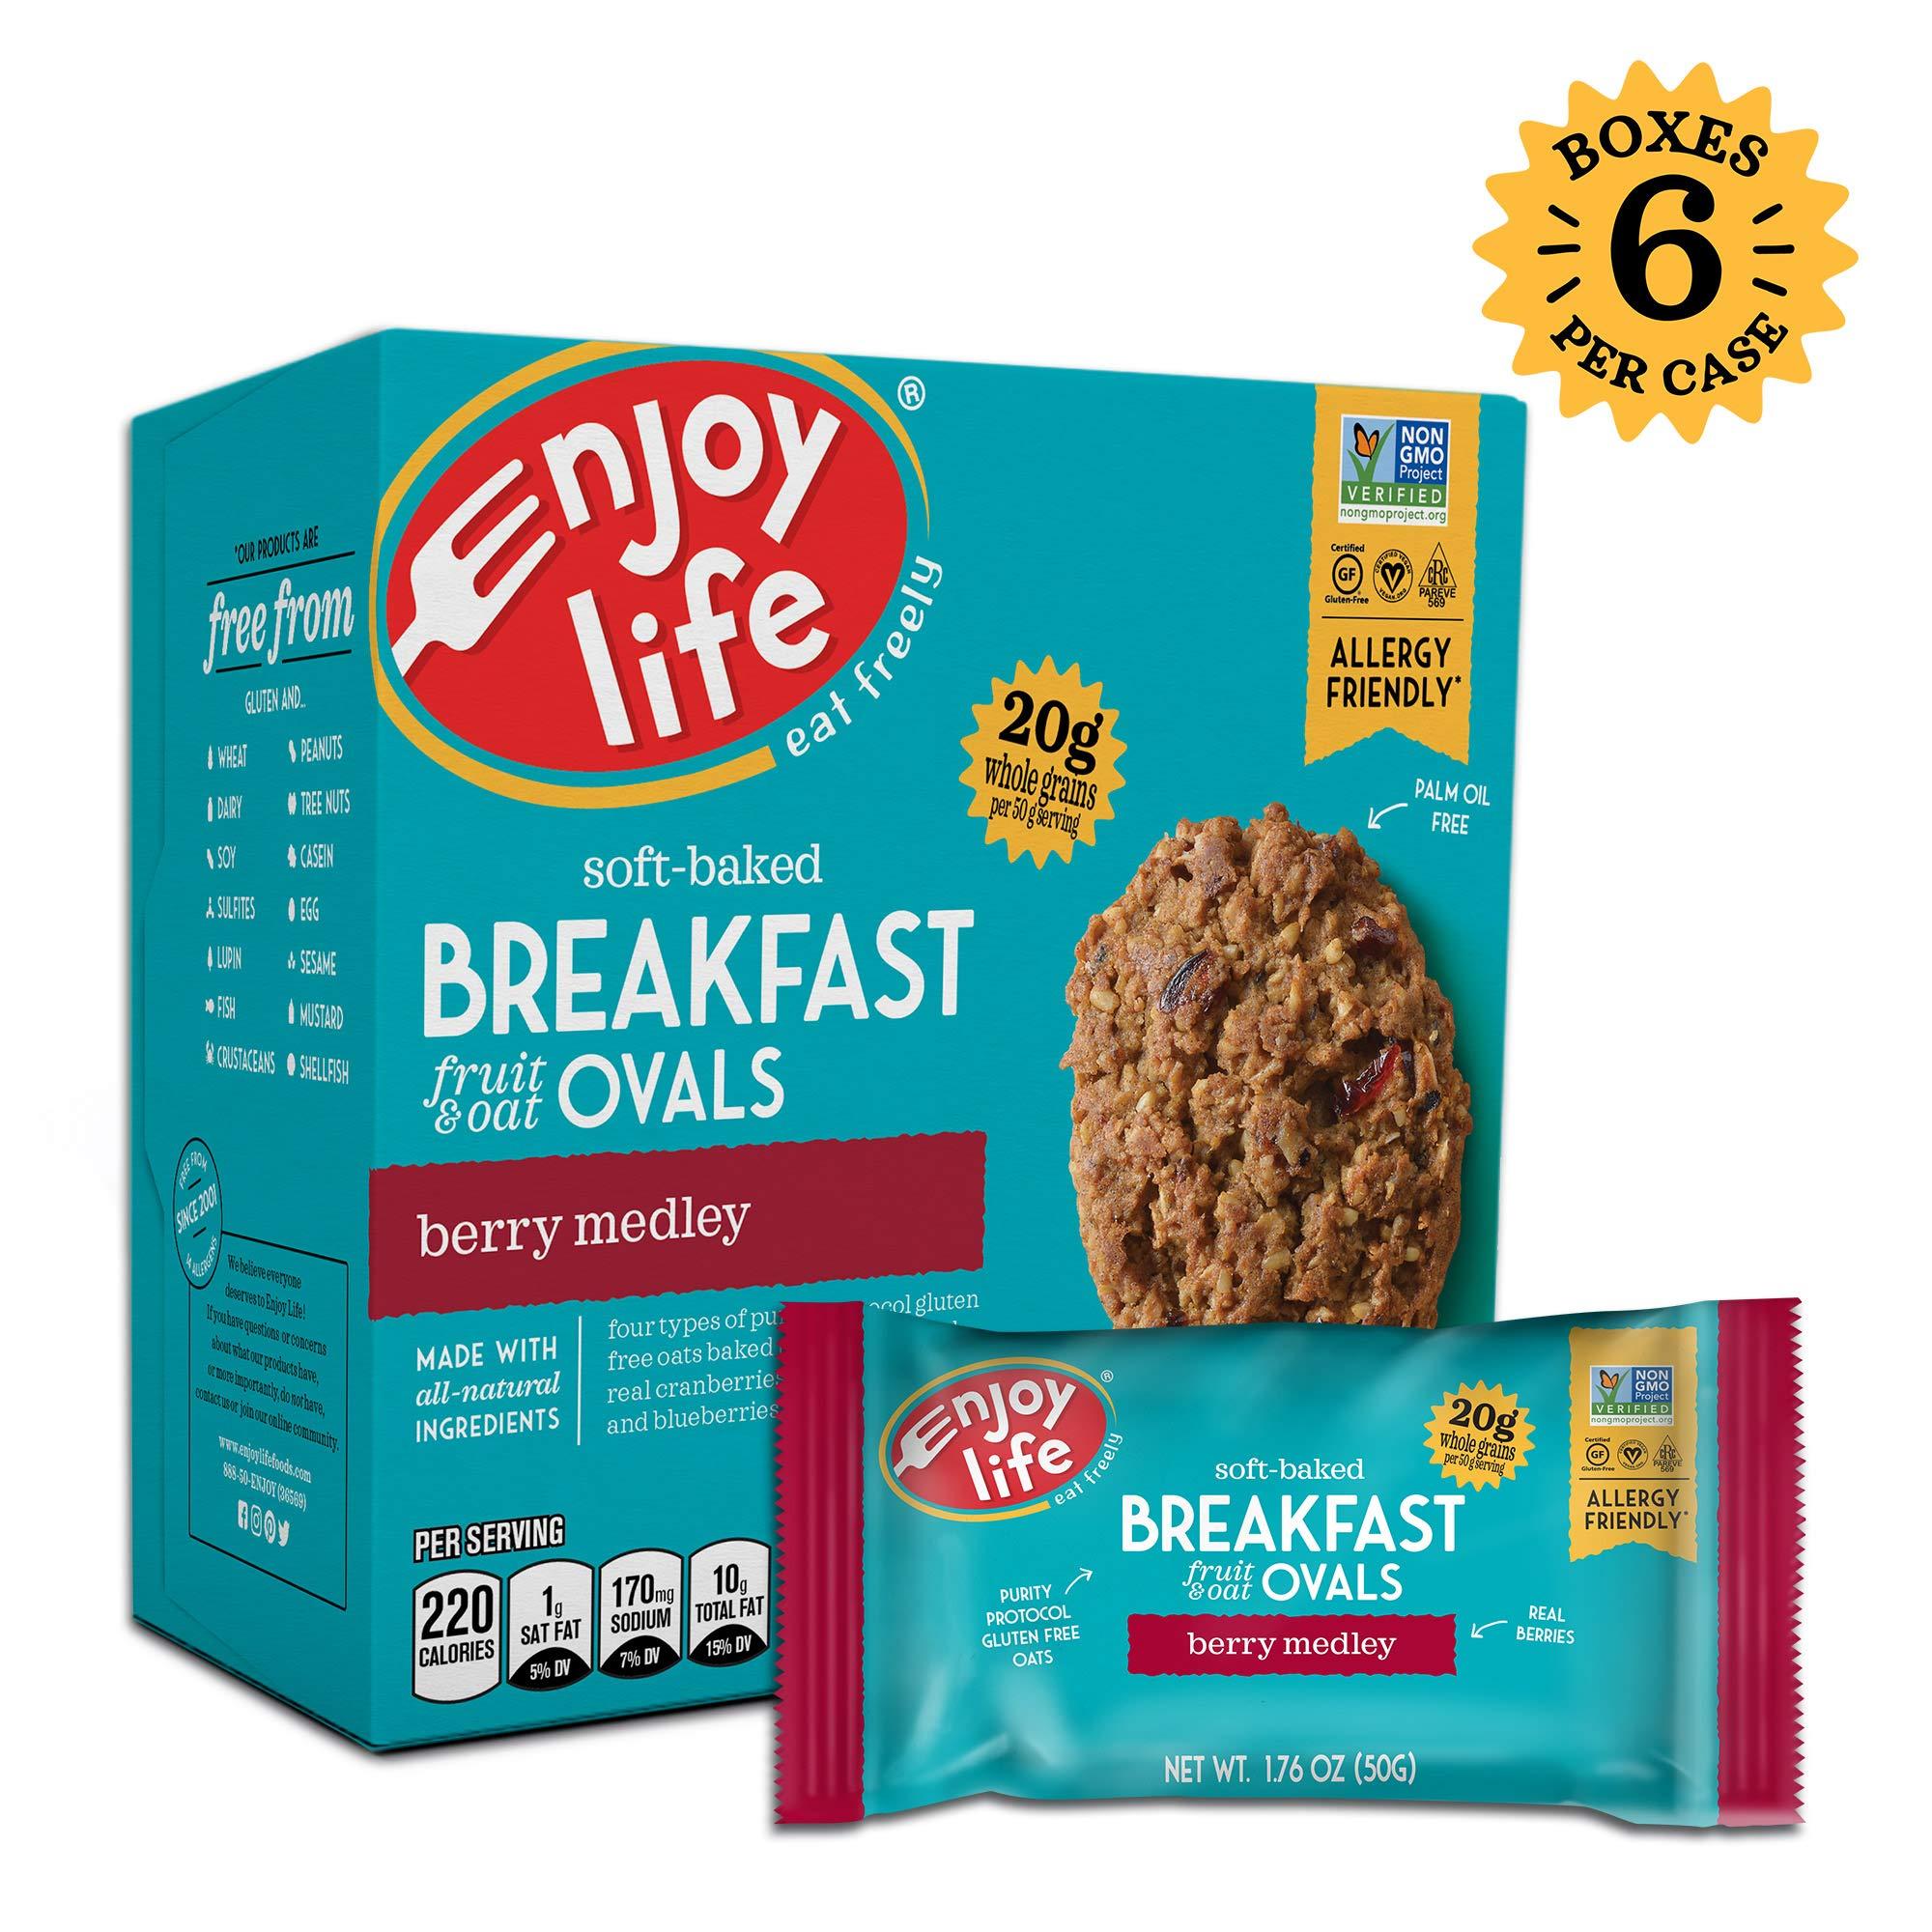 Enjoy Life Gluten Free Nut Free & Vegan Breakfast Cookies, Berry Medley, 6 Count Boxes, 30 Bars by Enjoy Life Foods